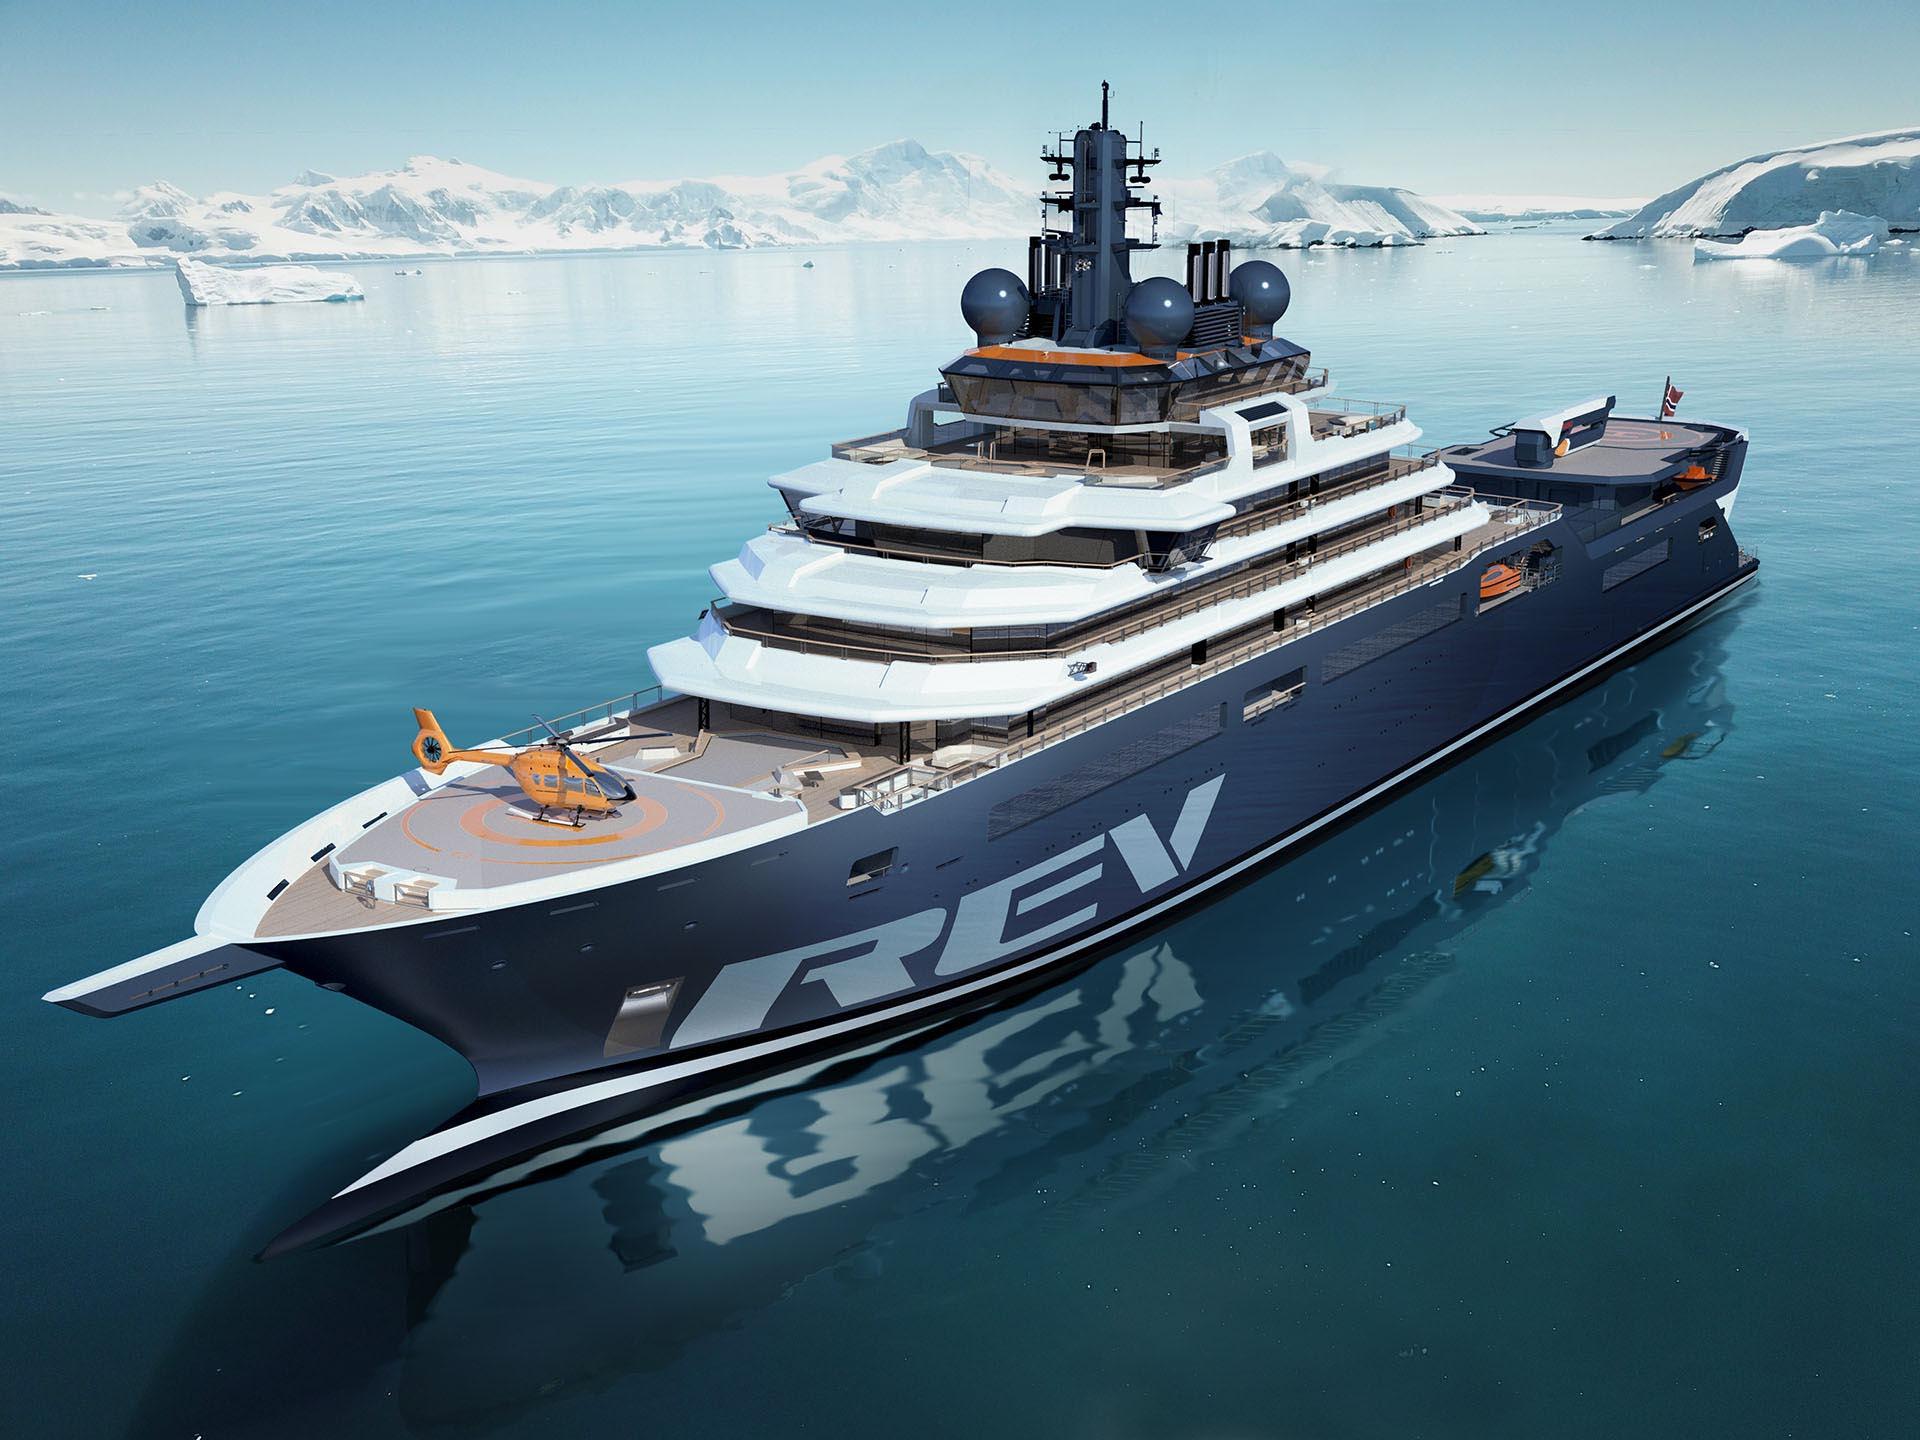 REV-Ocean render, supplied by Espen Oeino